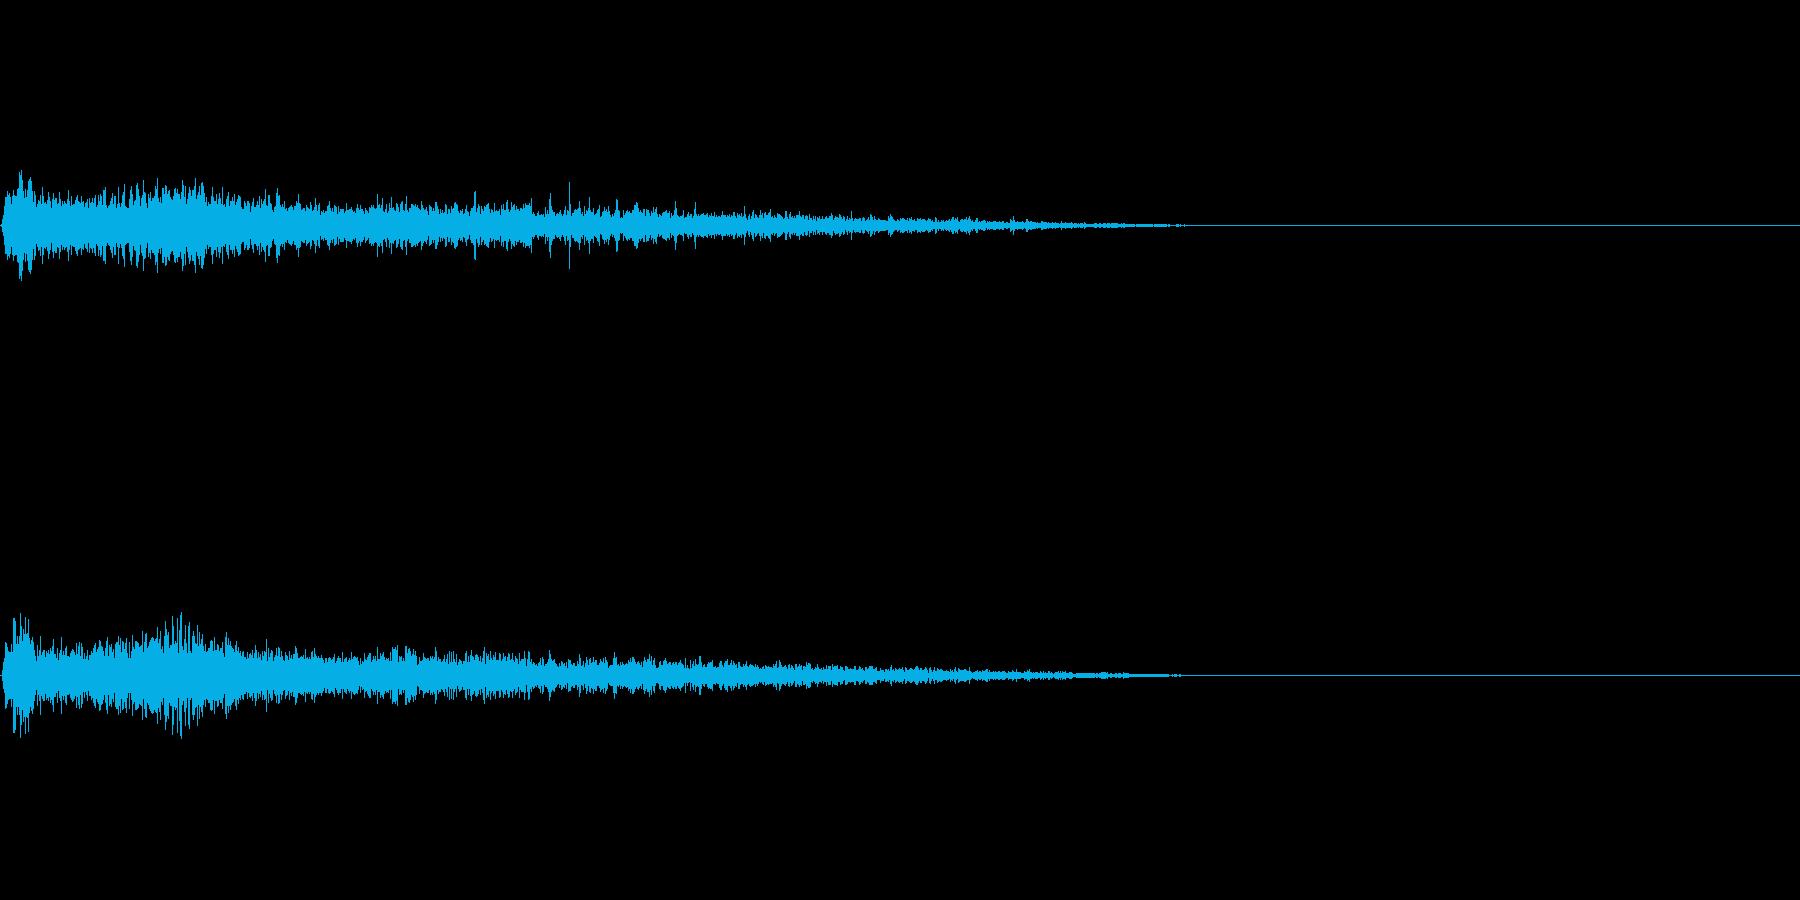 Bマイナー インパクト音 衝撃音の再生済みの波形